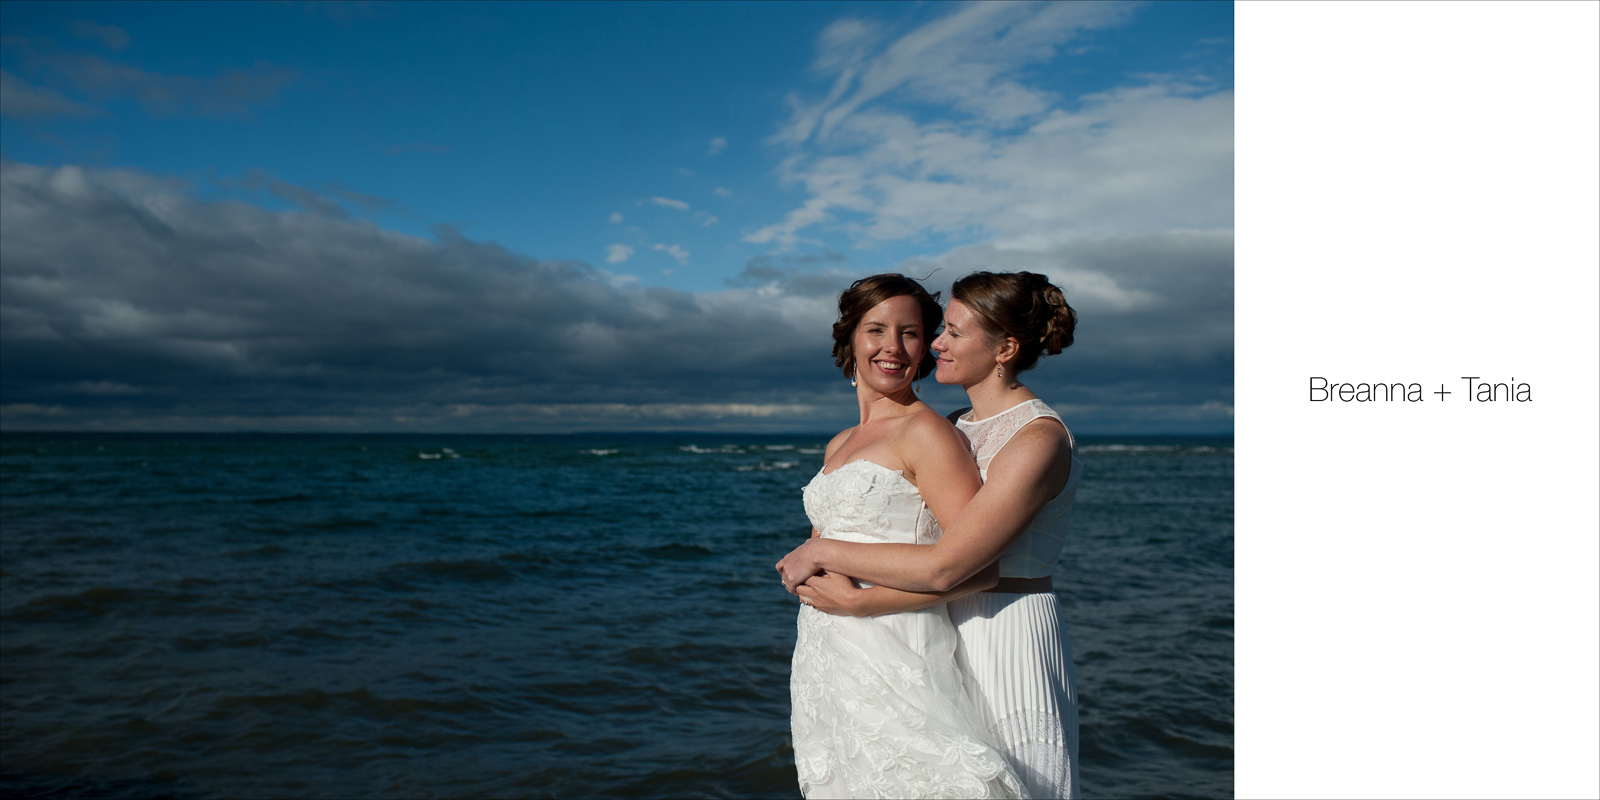 collingwood-wedding-photo-album-001.jpg